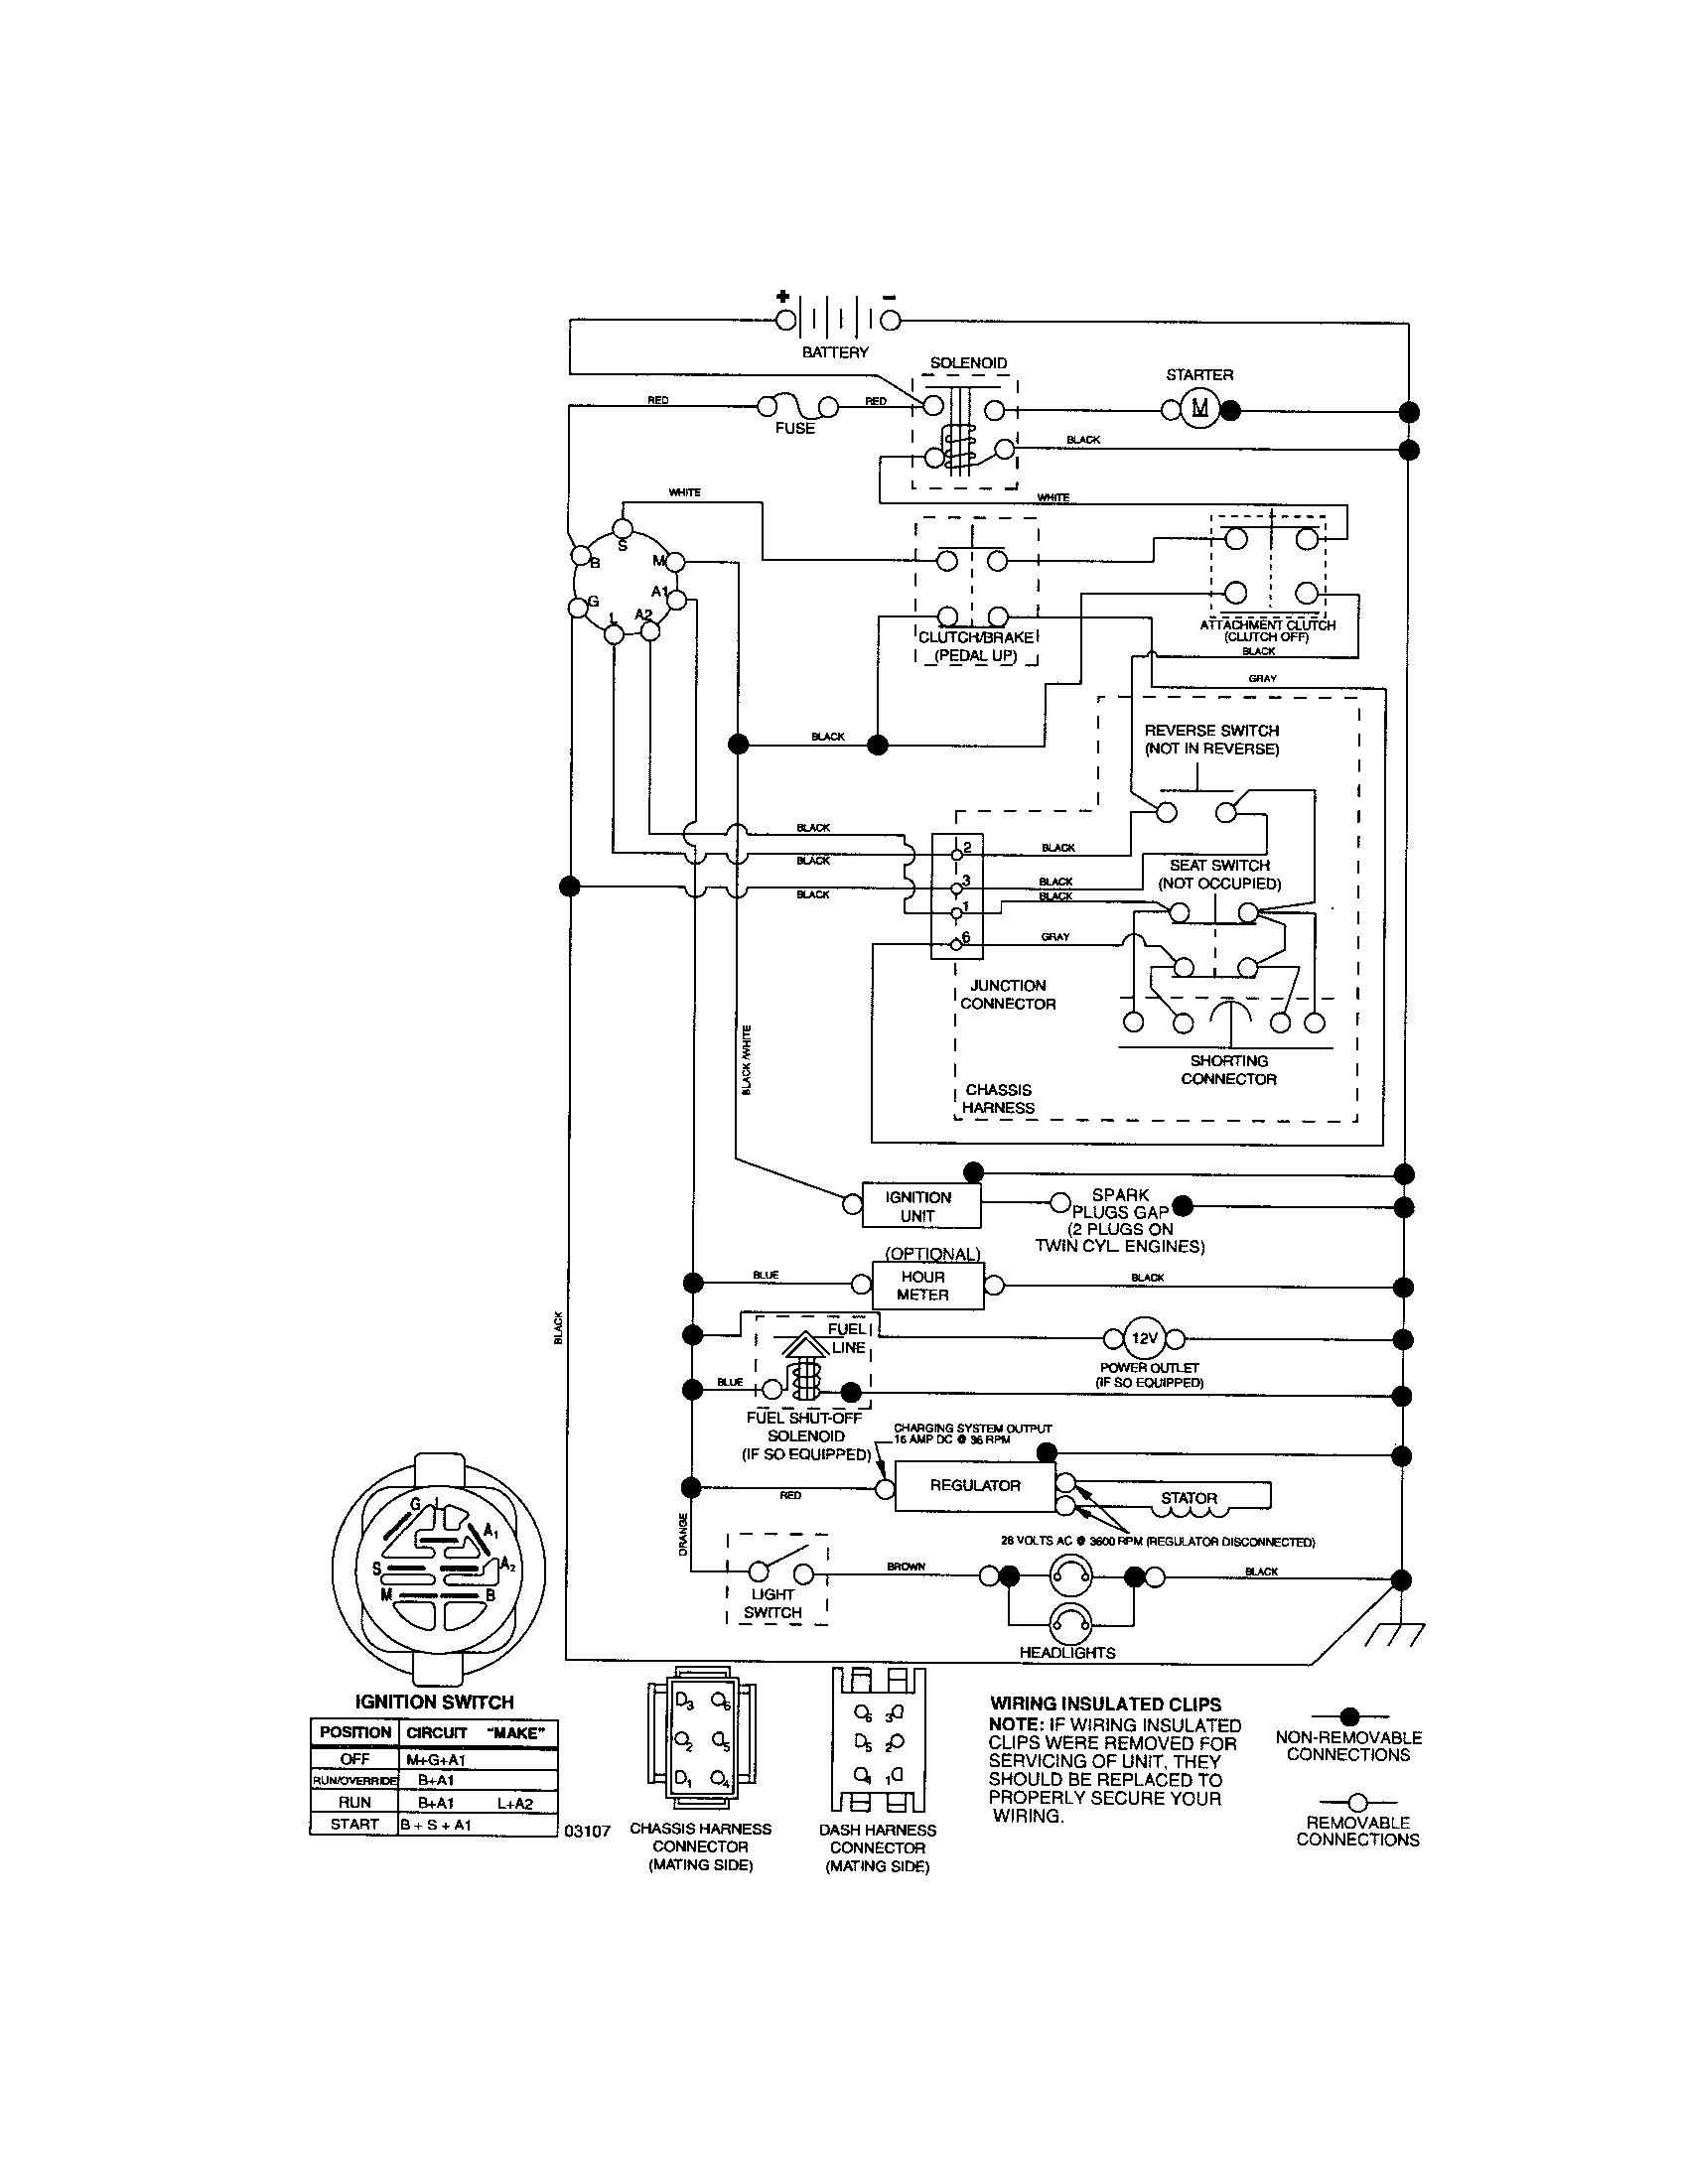 New Need Wiring Diagram Diagram Wiringdiagram